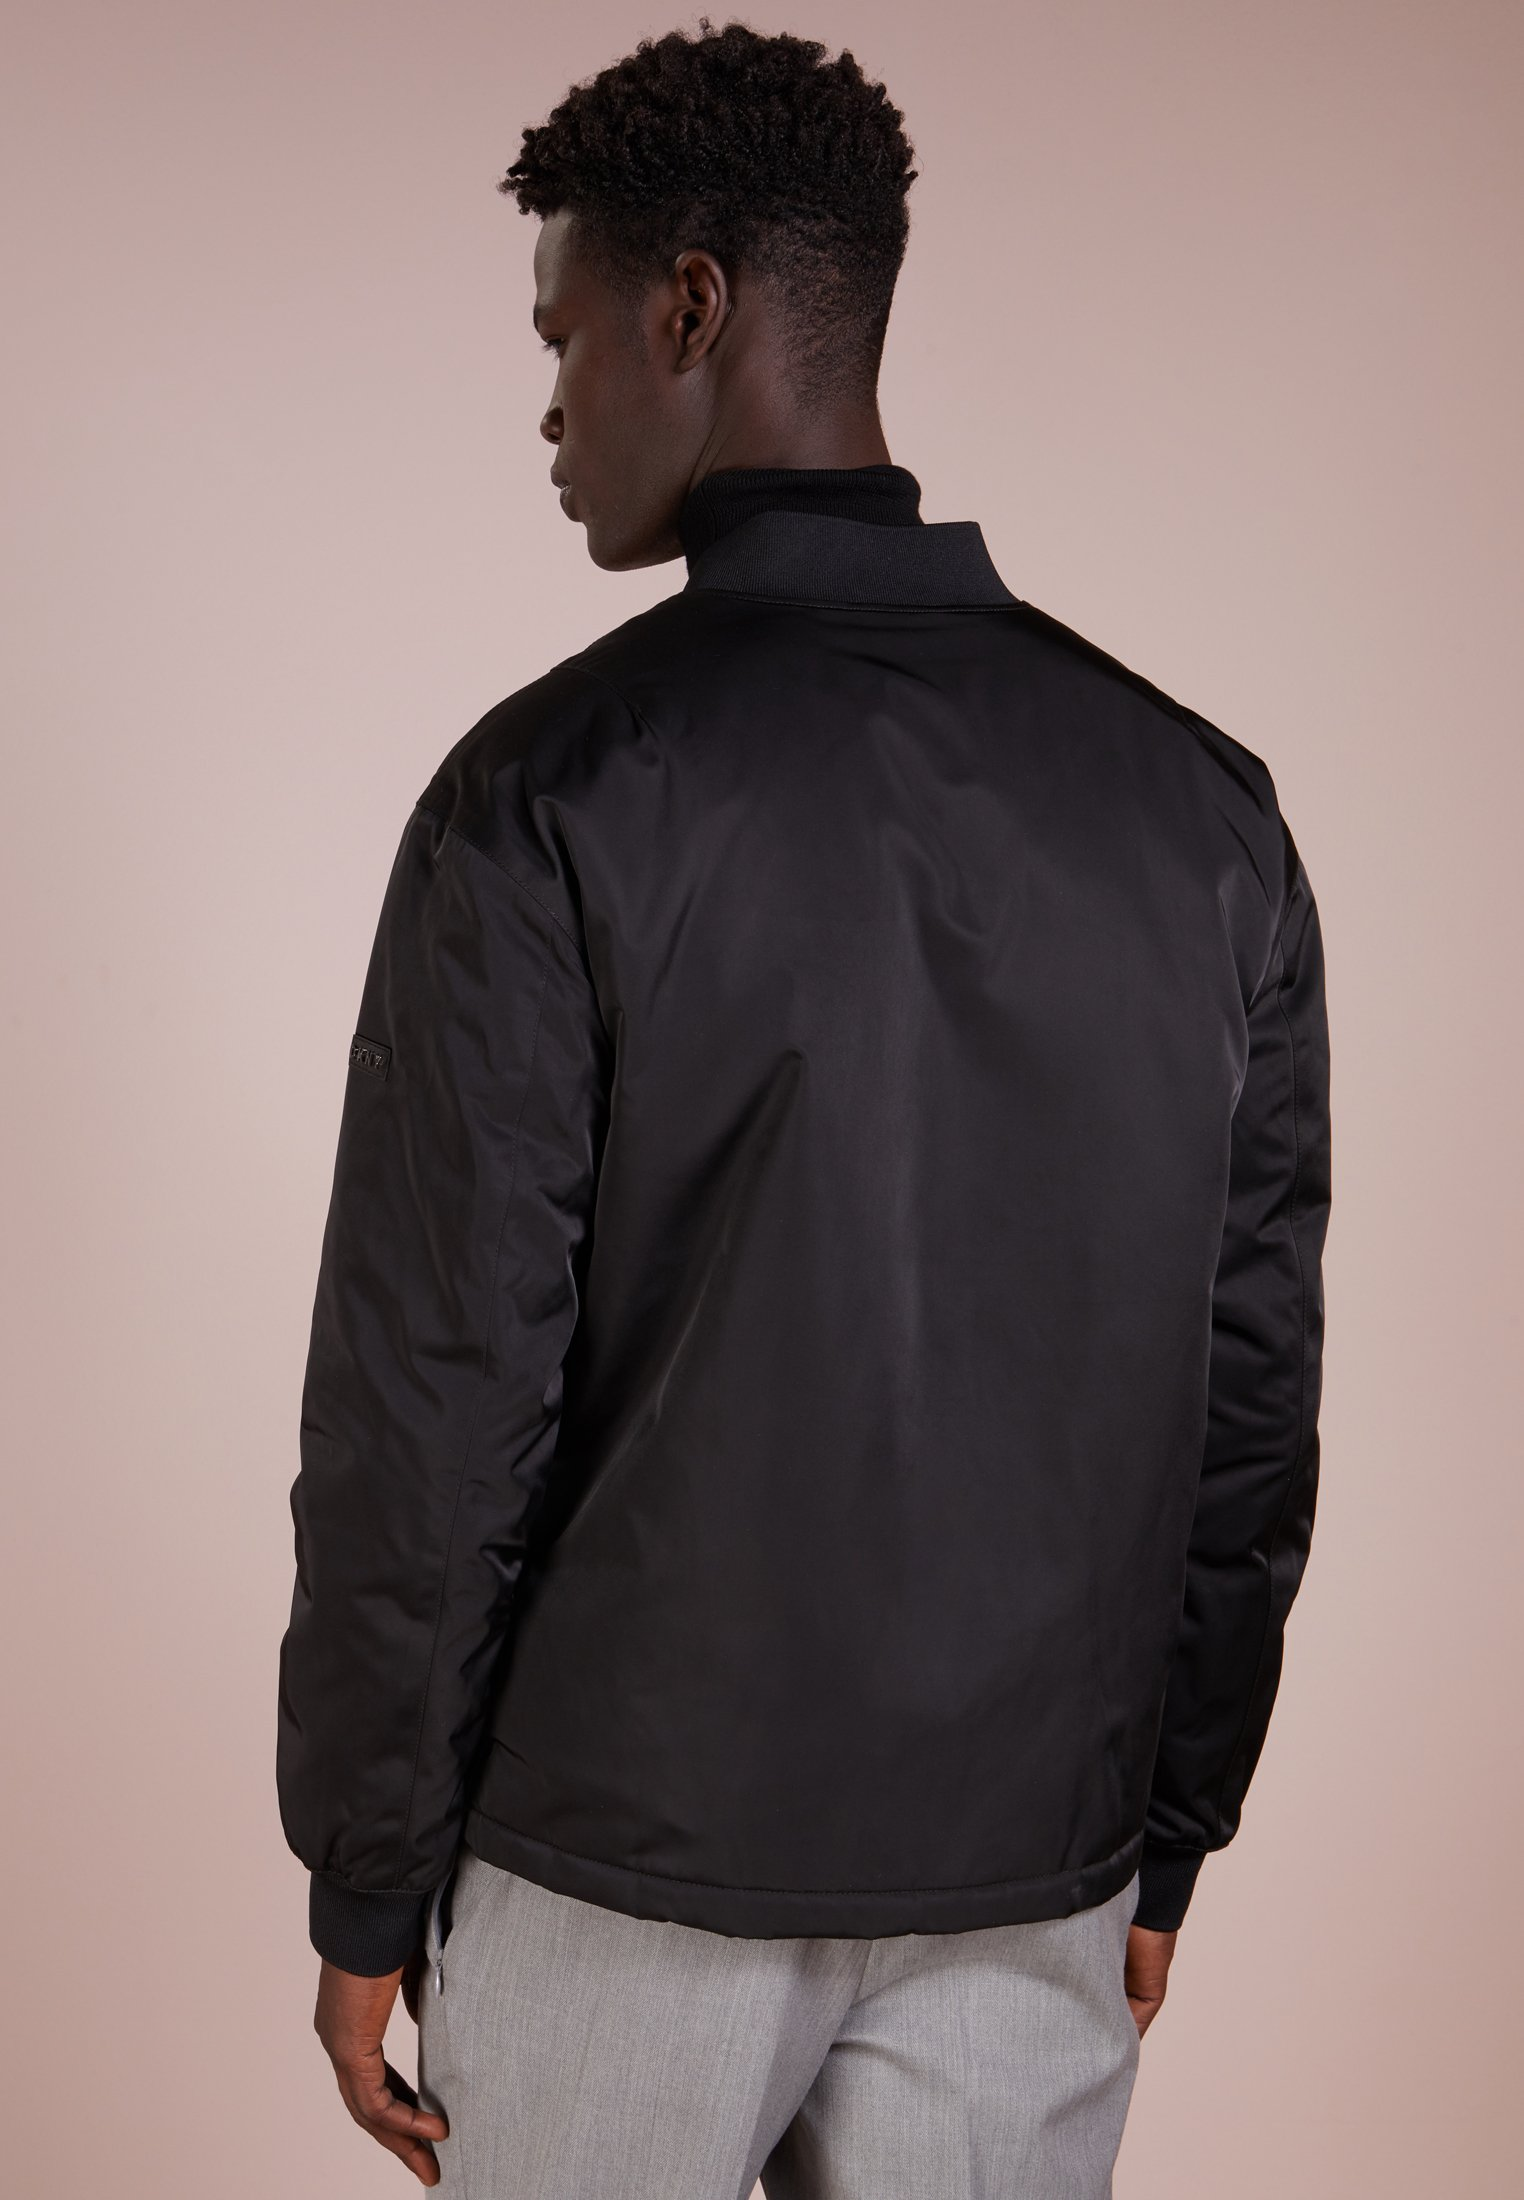 Fashion Black Depot JacketBlouson Bomber Dkny YyvfgIb67